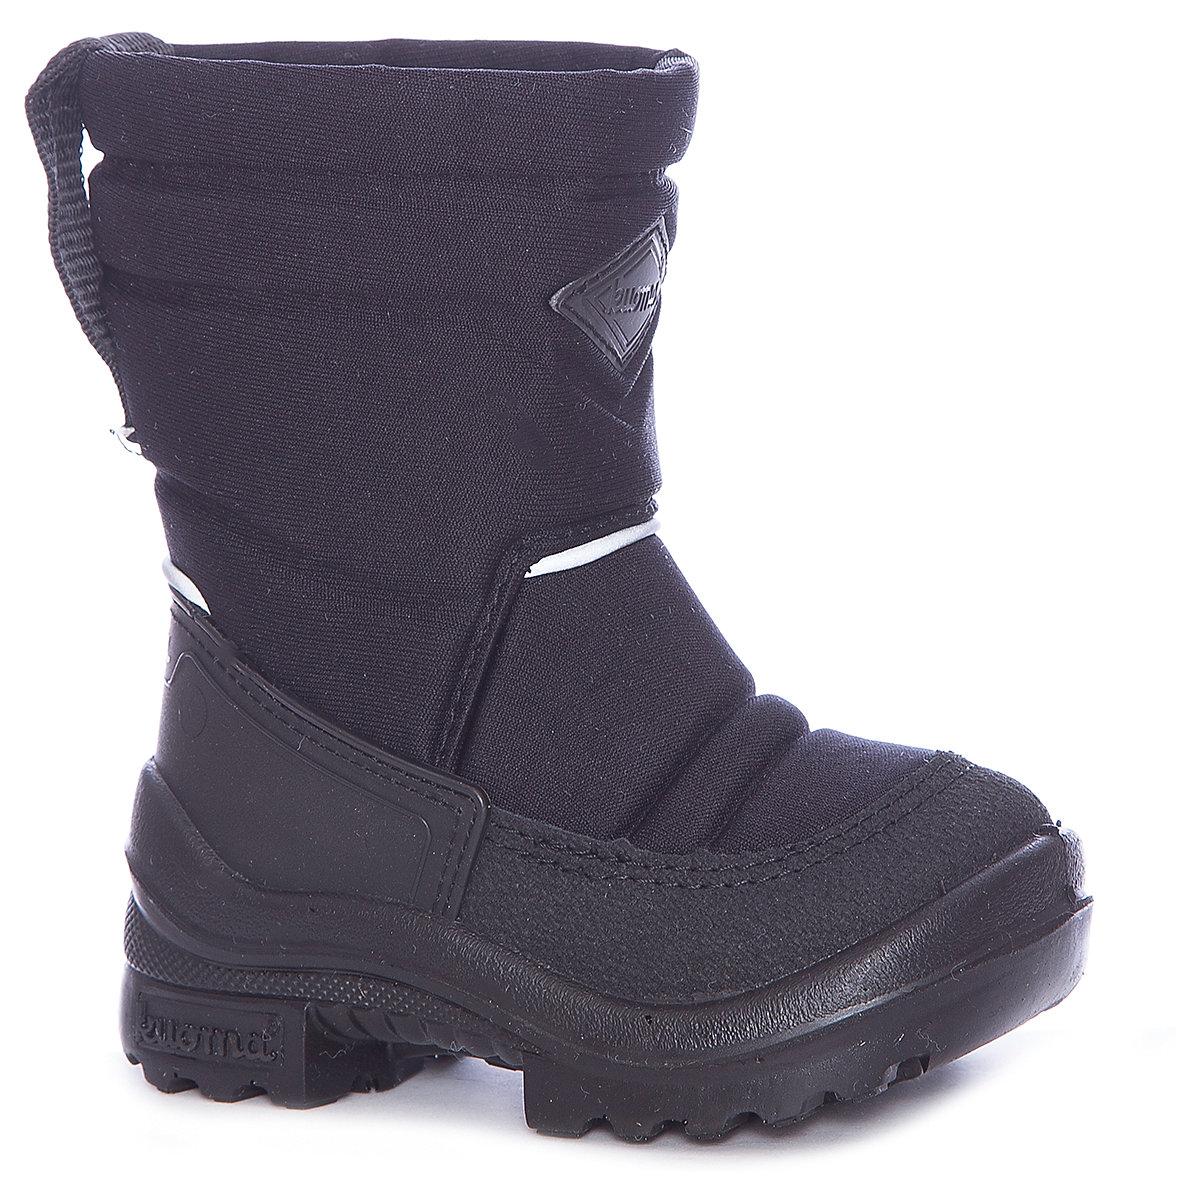 Boots KUOMA for boys 7118640 Valenki Uggi Winter Baby Kids Children shoes boots kuoma for boys 7118756 valenki uggi winter shoes children kids